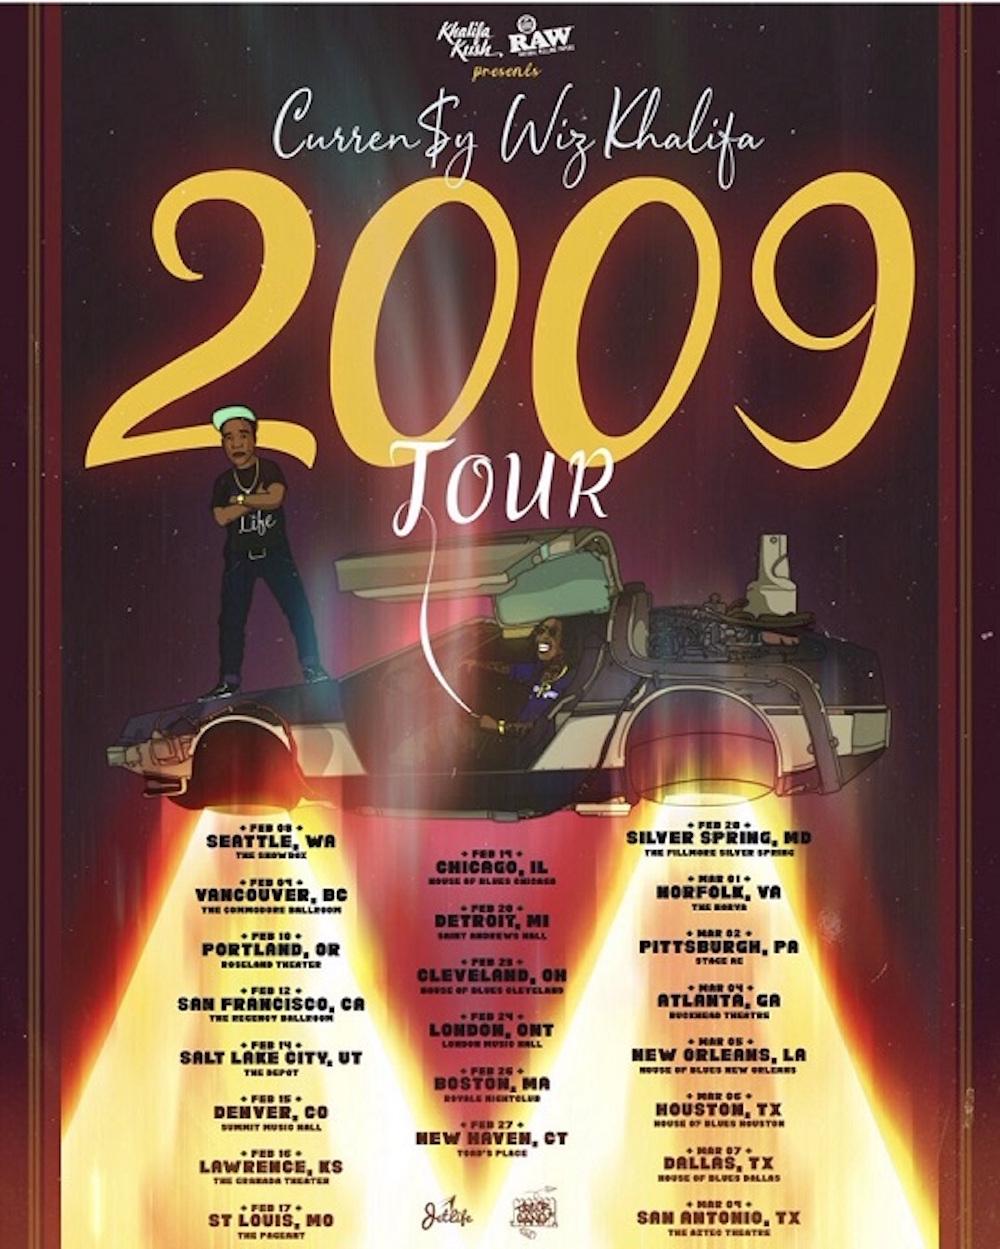 Currensy Wiz Khalifa 2009 Tour